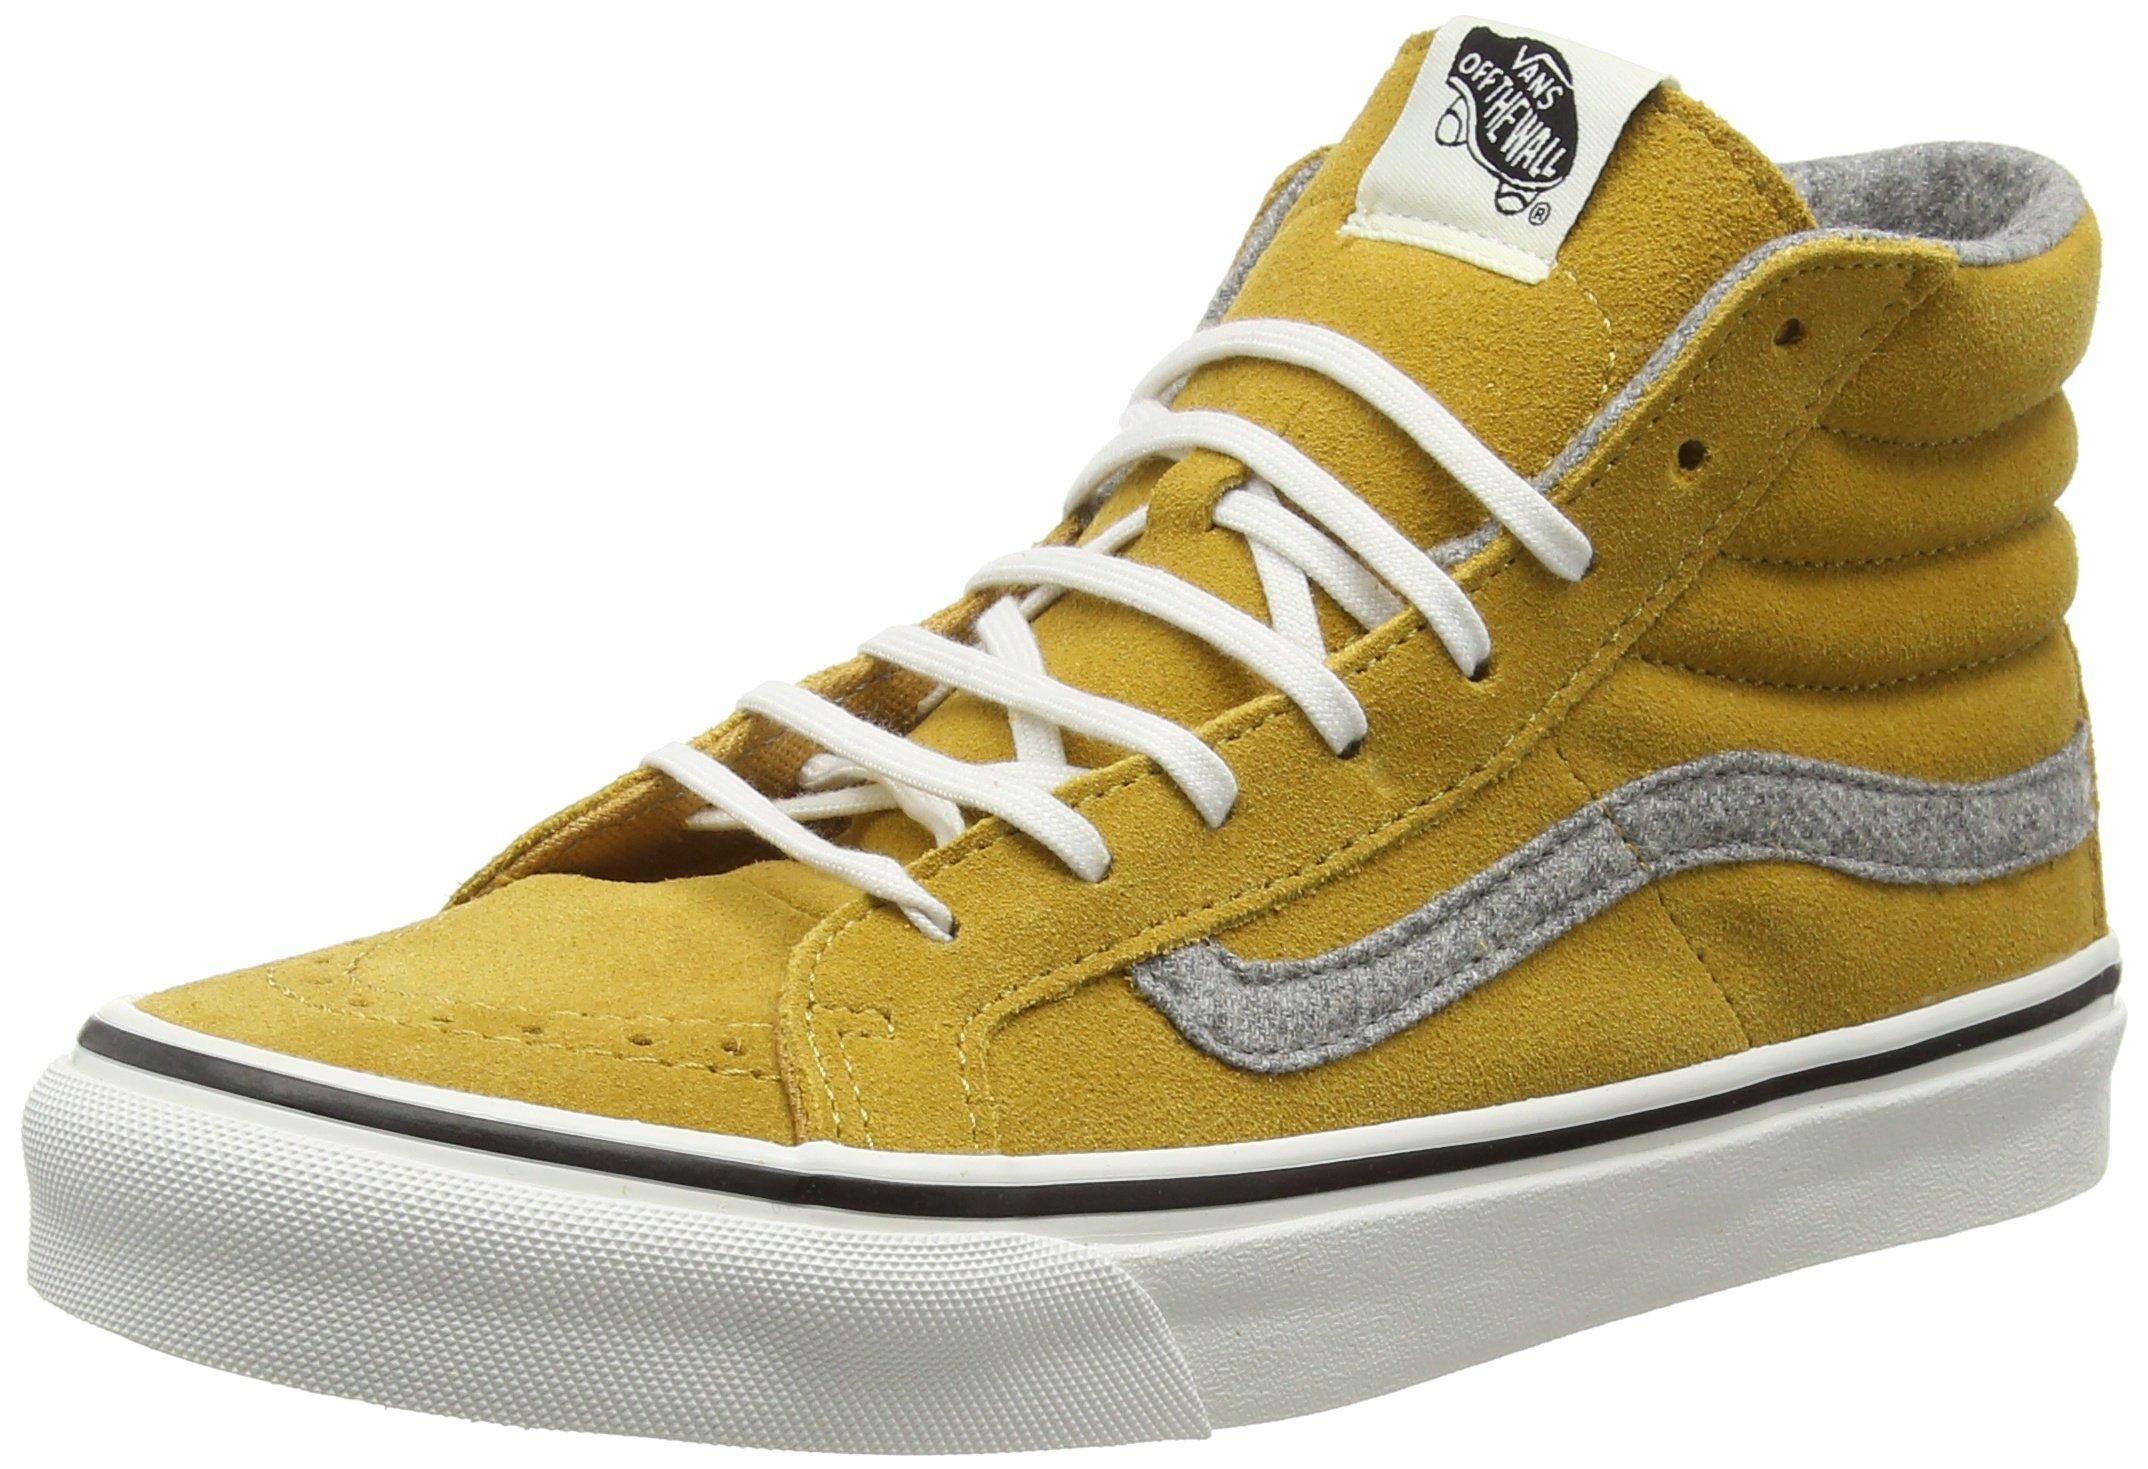 Vans Sk8-Hi Slim, Unisex Adults Hi-Top Sneakers, Yellow (Vintage Suede Amber Gold), 6 UK (39 EU)